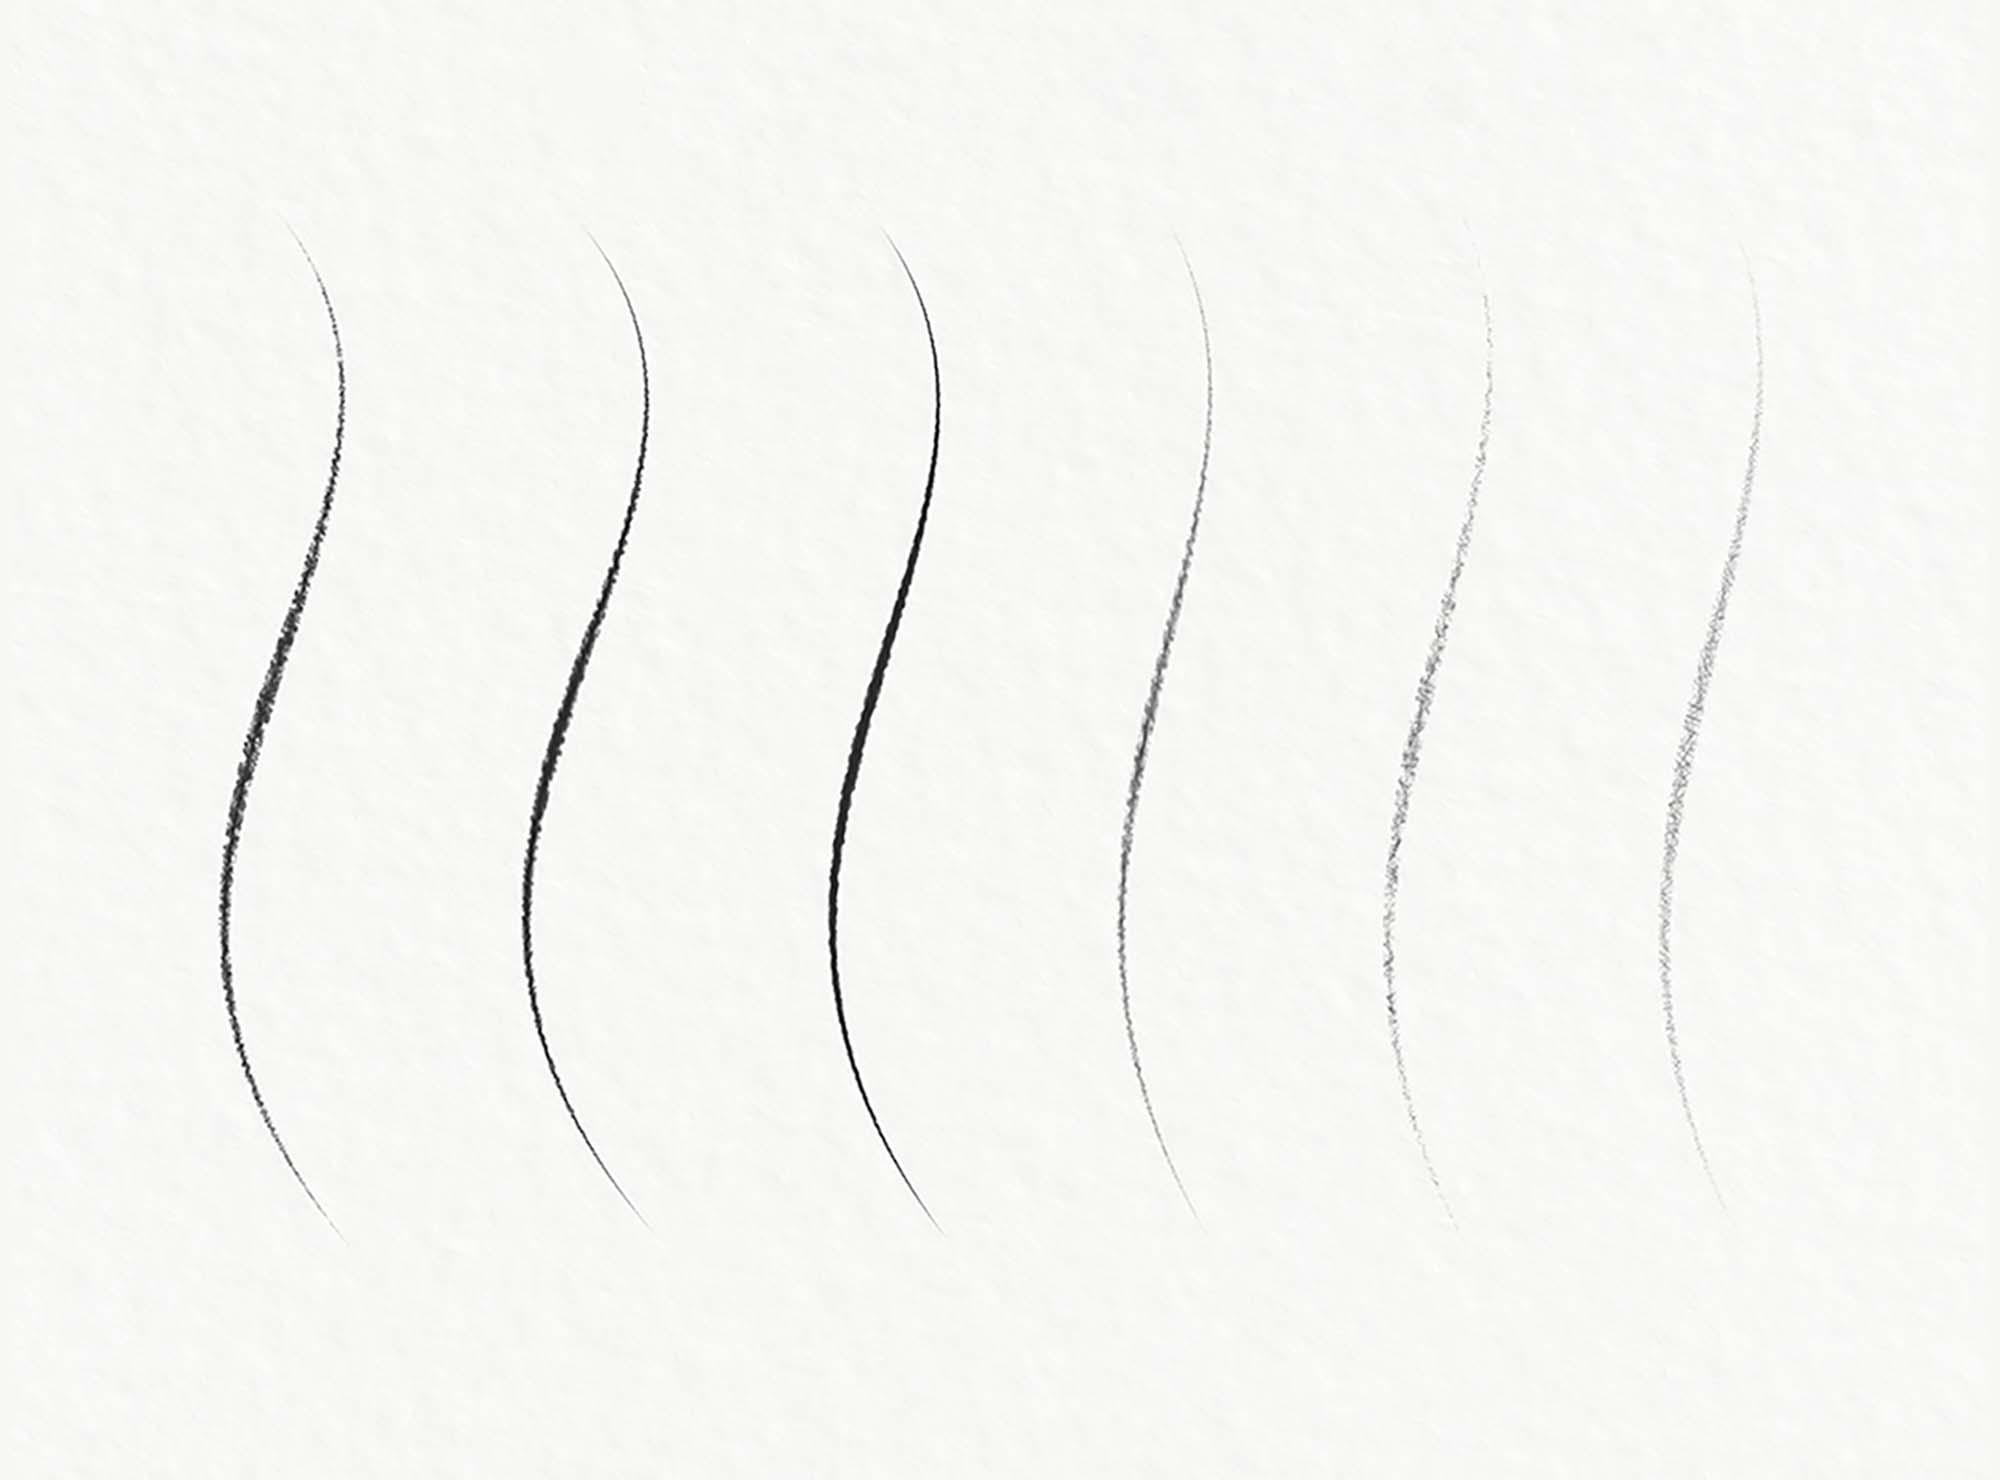 Graphite Pencil Photoshop Brushes